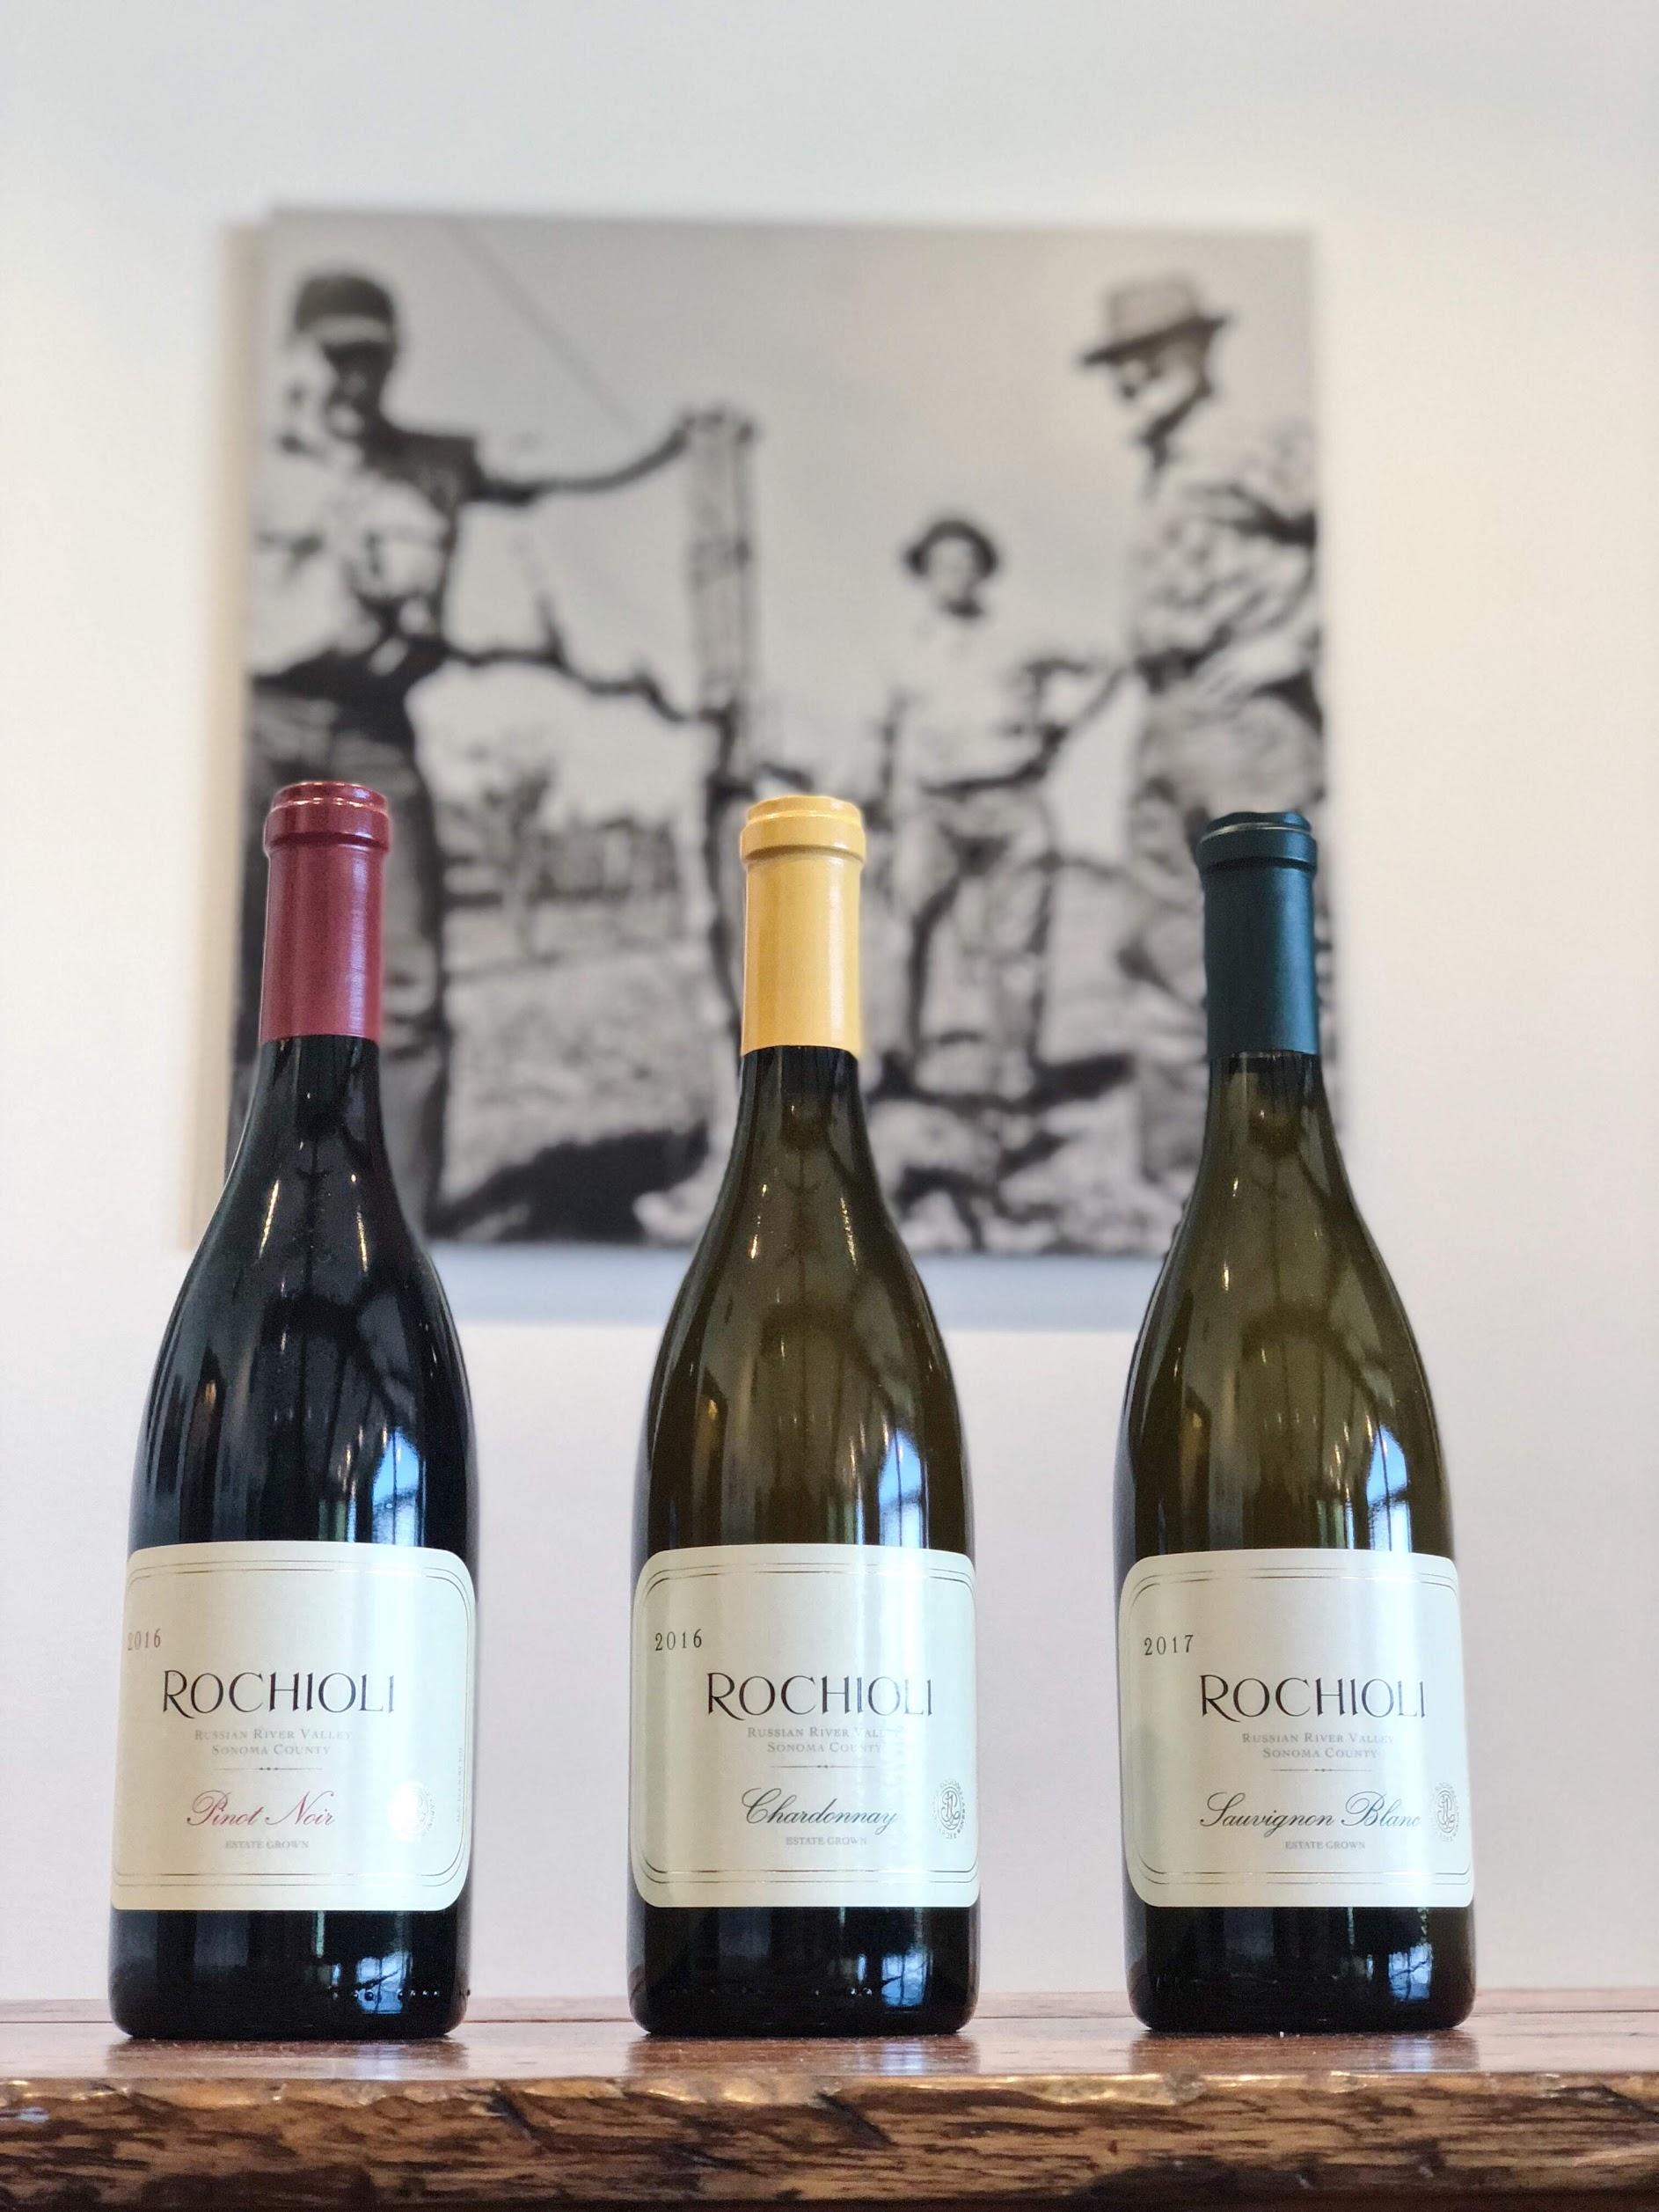 Rochioli Pinot Noir and Chardonnay Wines